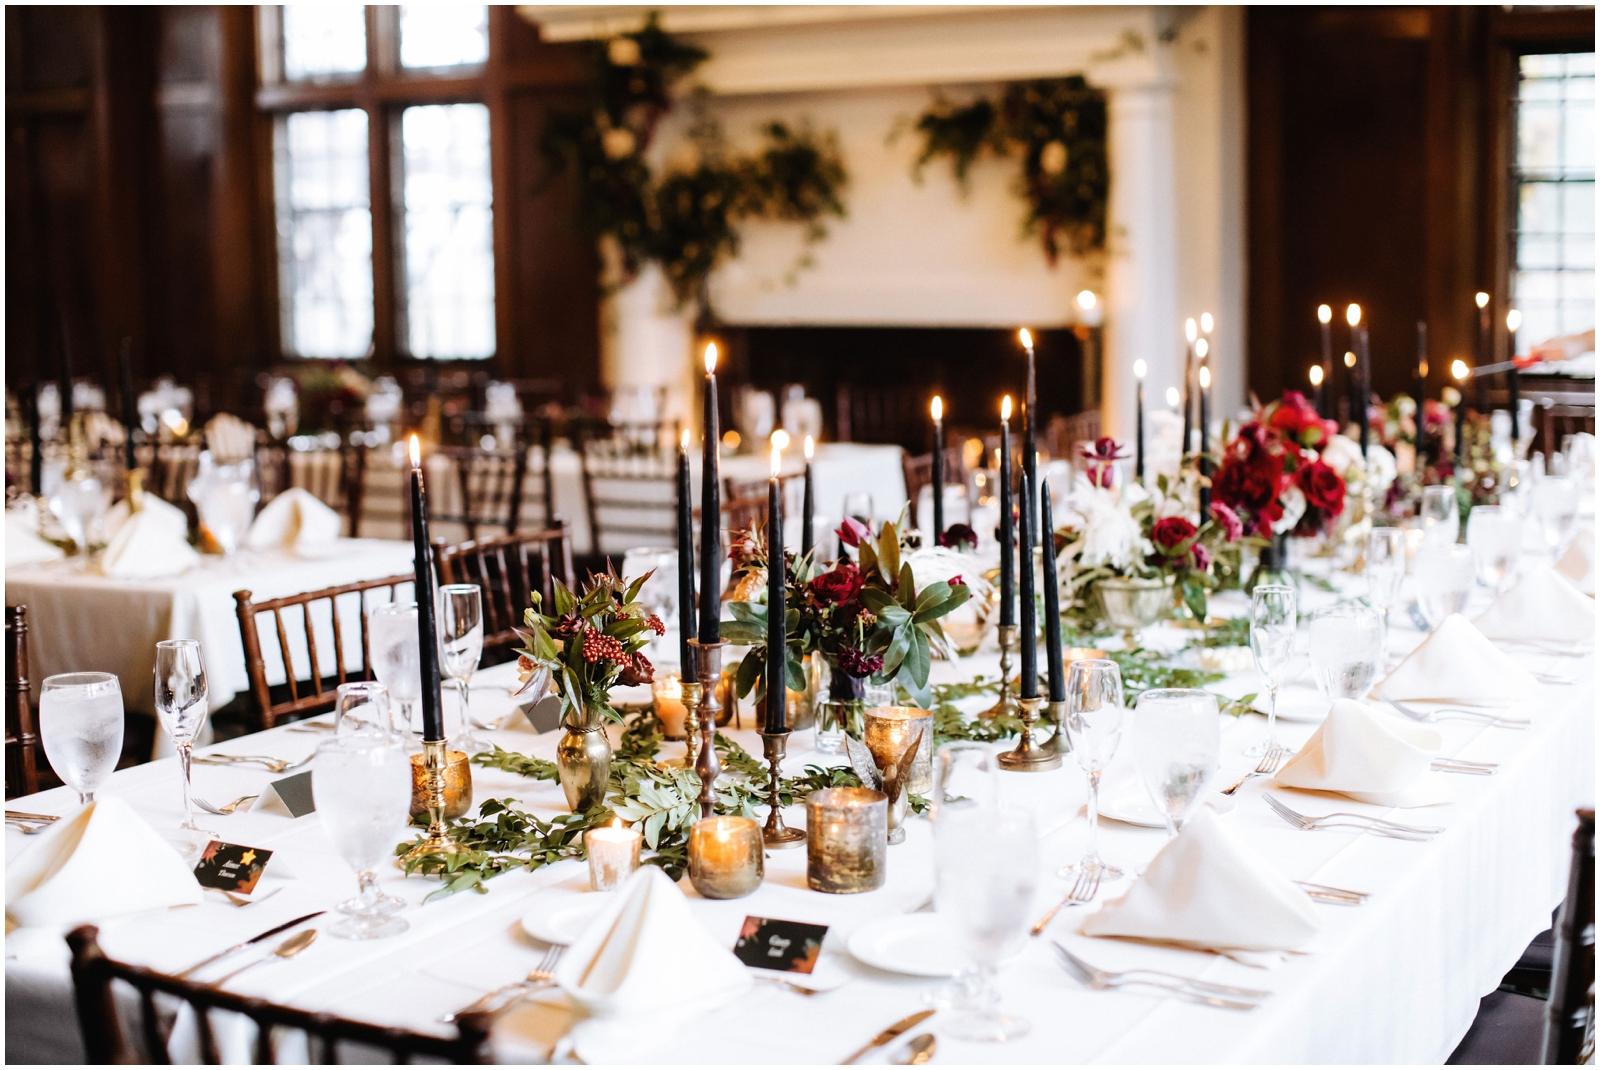 Minnesota Wedding Planner, Mpls Wedding Planner, Machine Shop MPLS, Mpls Wedding Venue. Greenery wedding decor